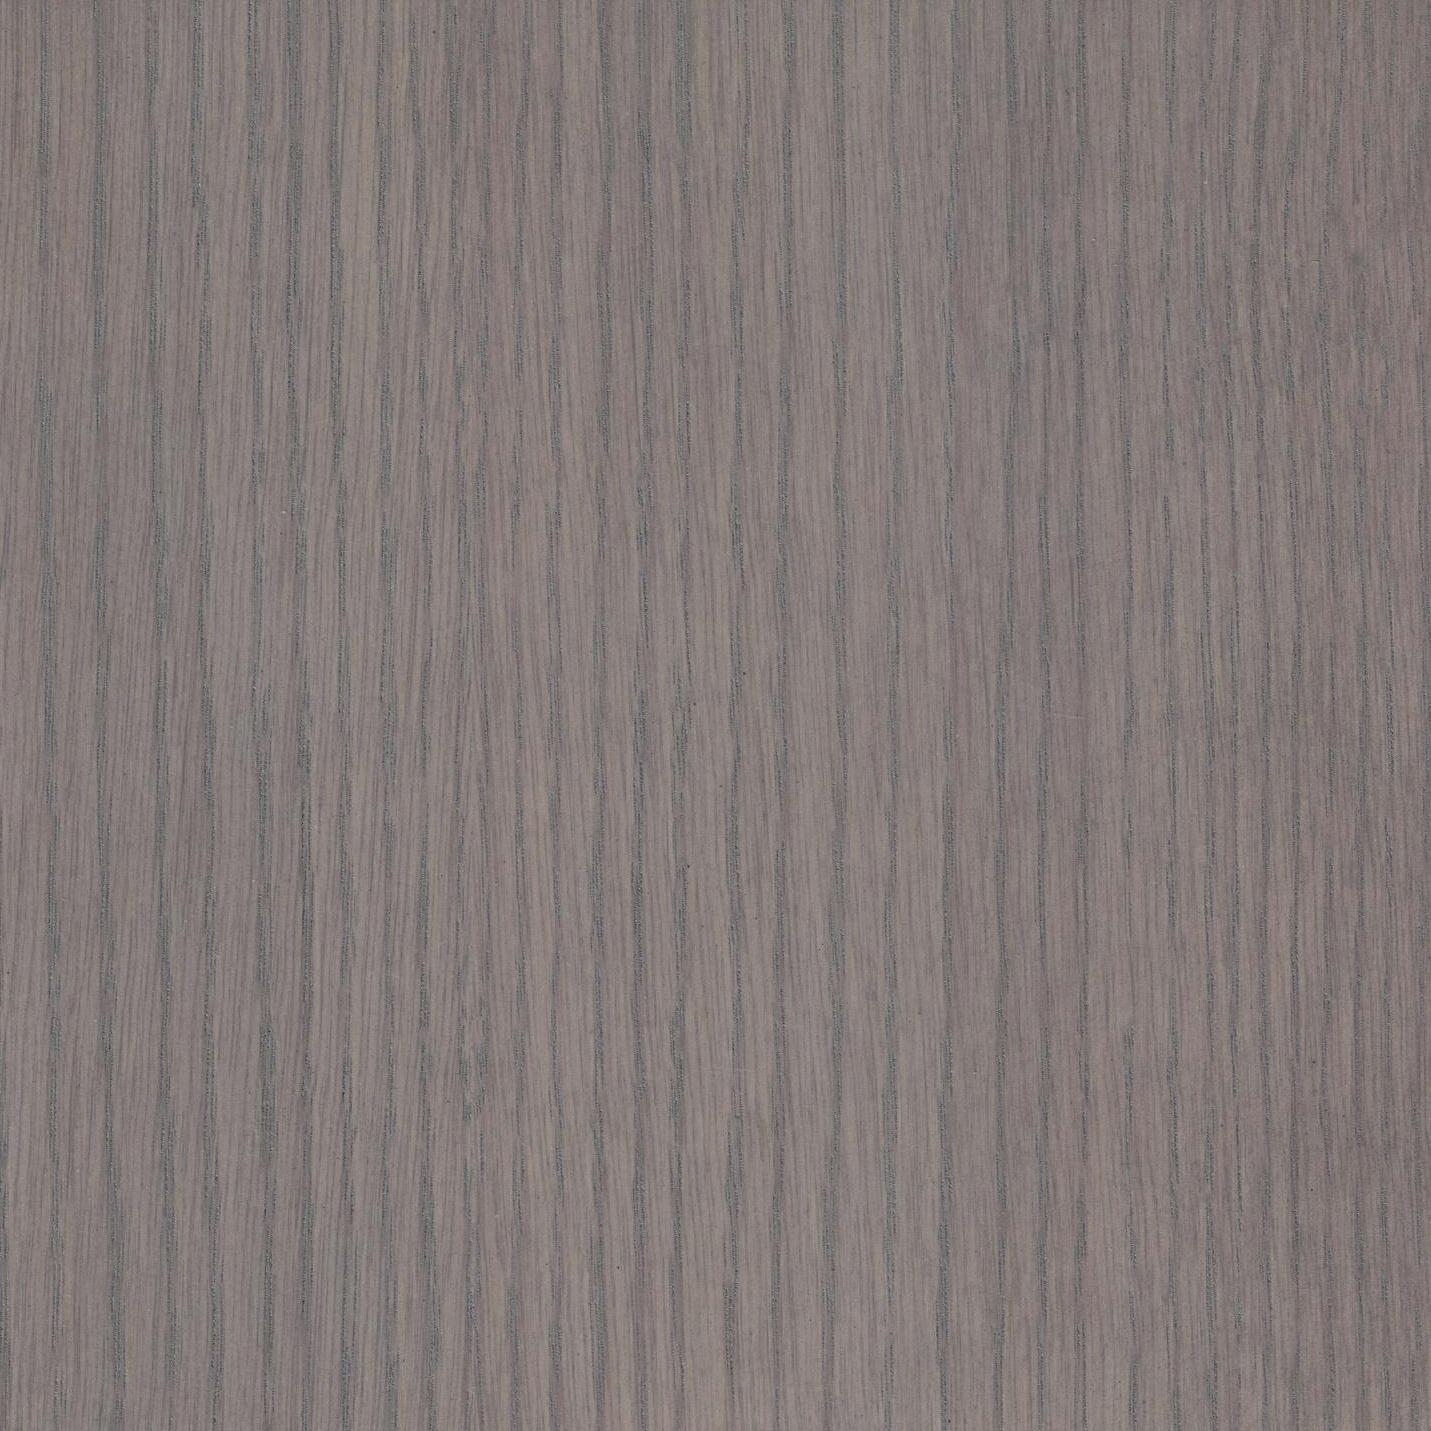 WD-12 Cerused Storm Grey Oak